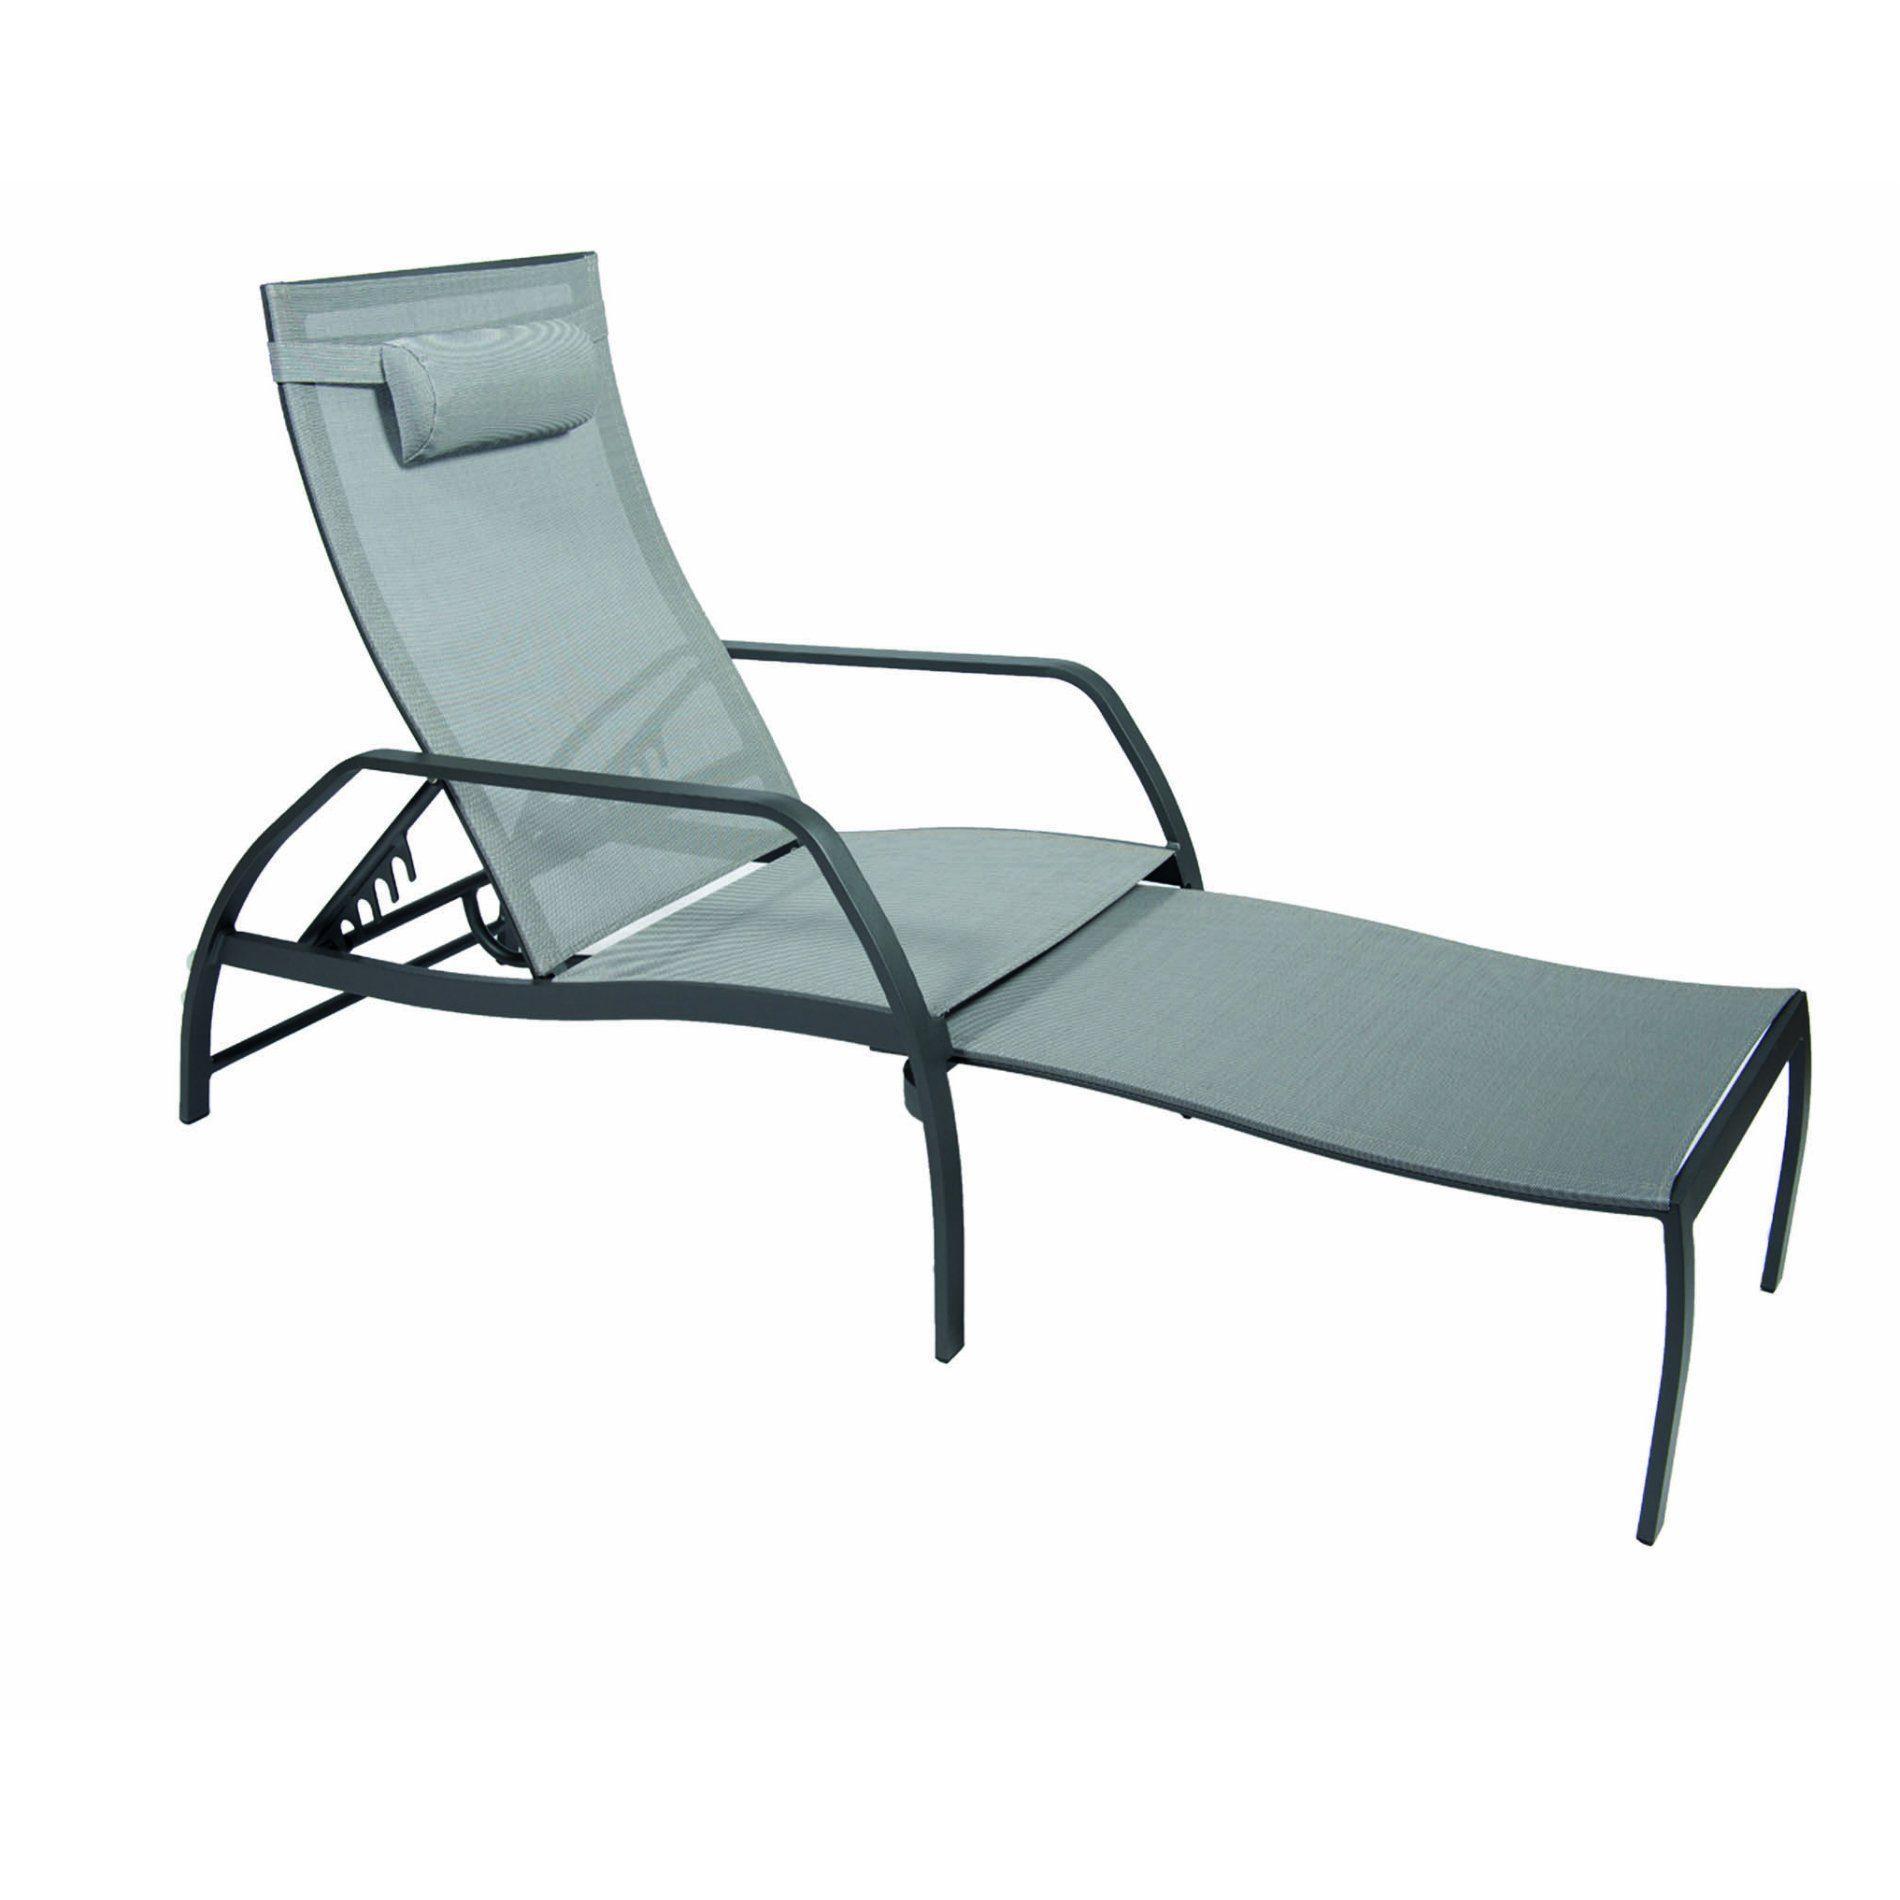 Deckchair Vedia von Jati&Kebon, Aluminium eisengrau, Textilgewebe silbergrau